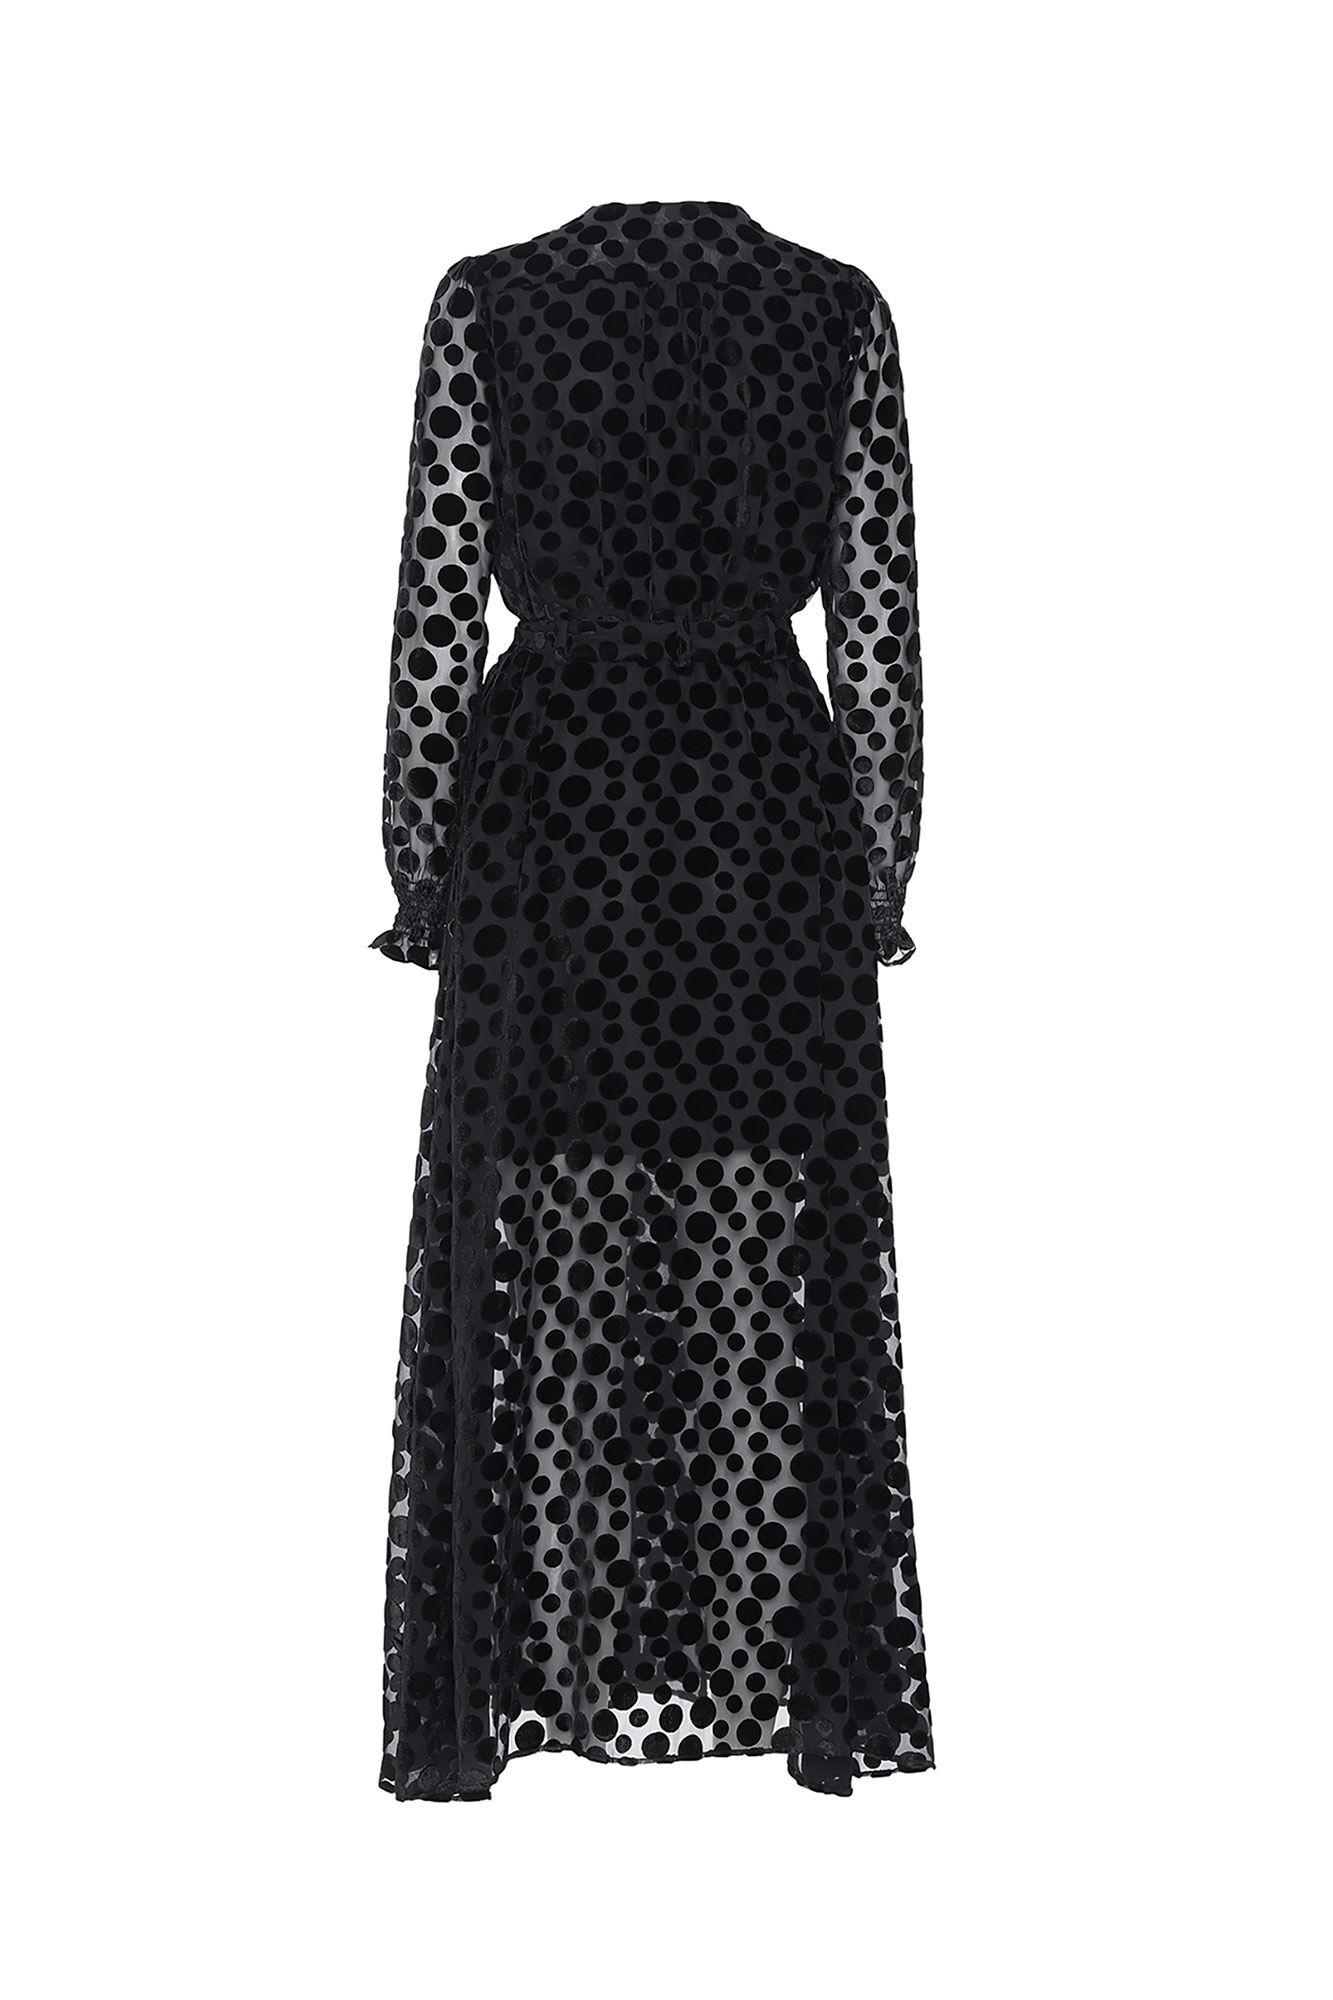 Paula long dress 3423644-001, BLACK POLKA DOTS